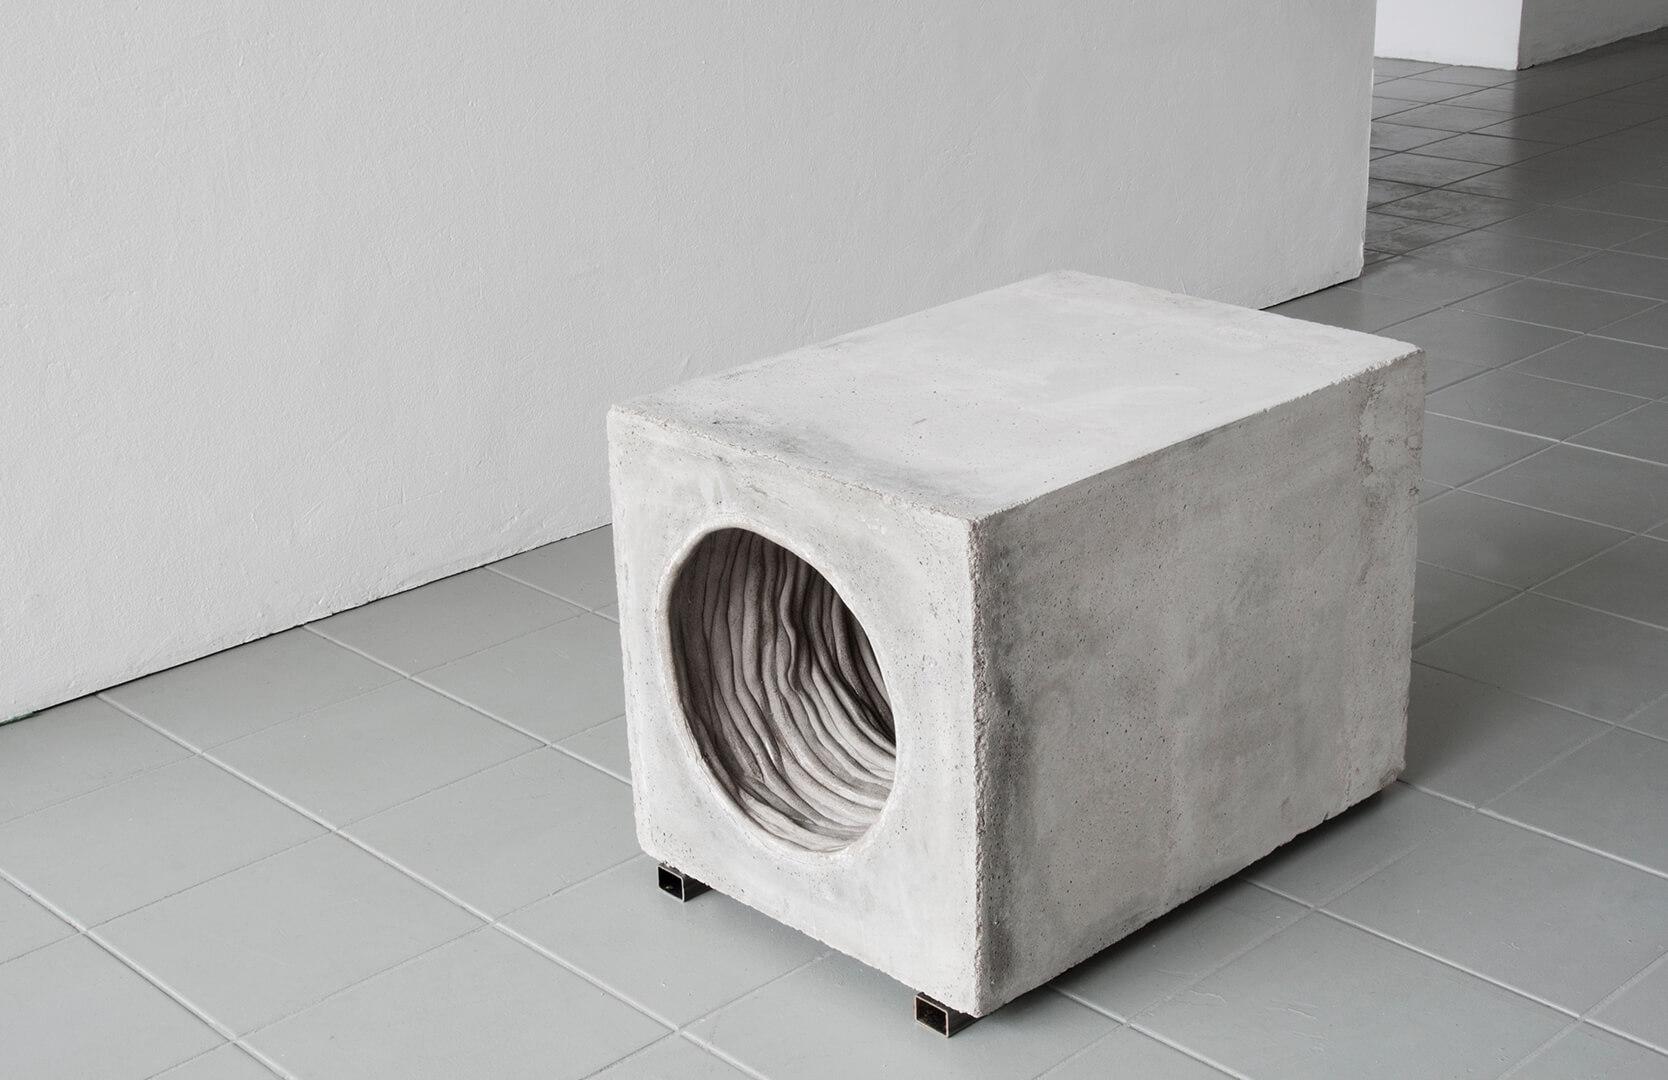 Meditation on orange fruitsDimensions: 33,5 x 47 x 33,5 cmMaterials: Concrete, ceramics and steel.2019